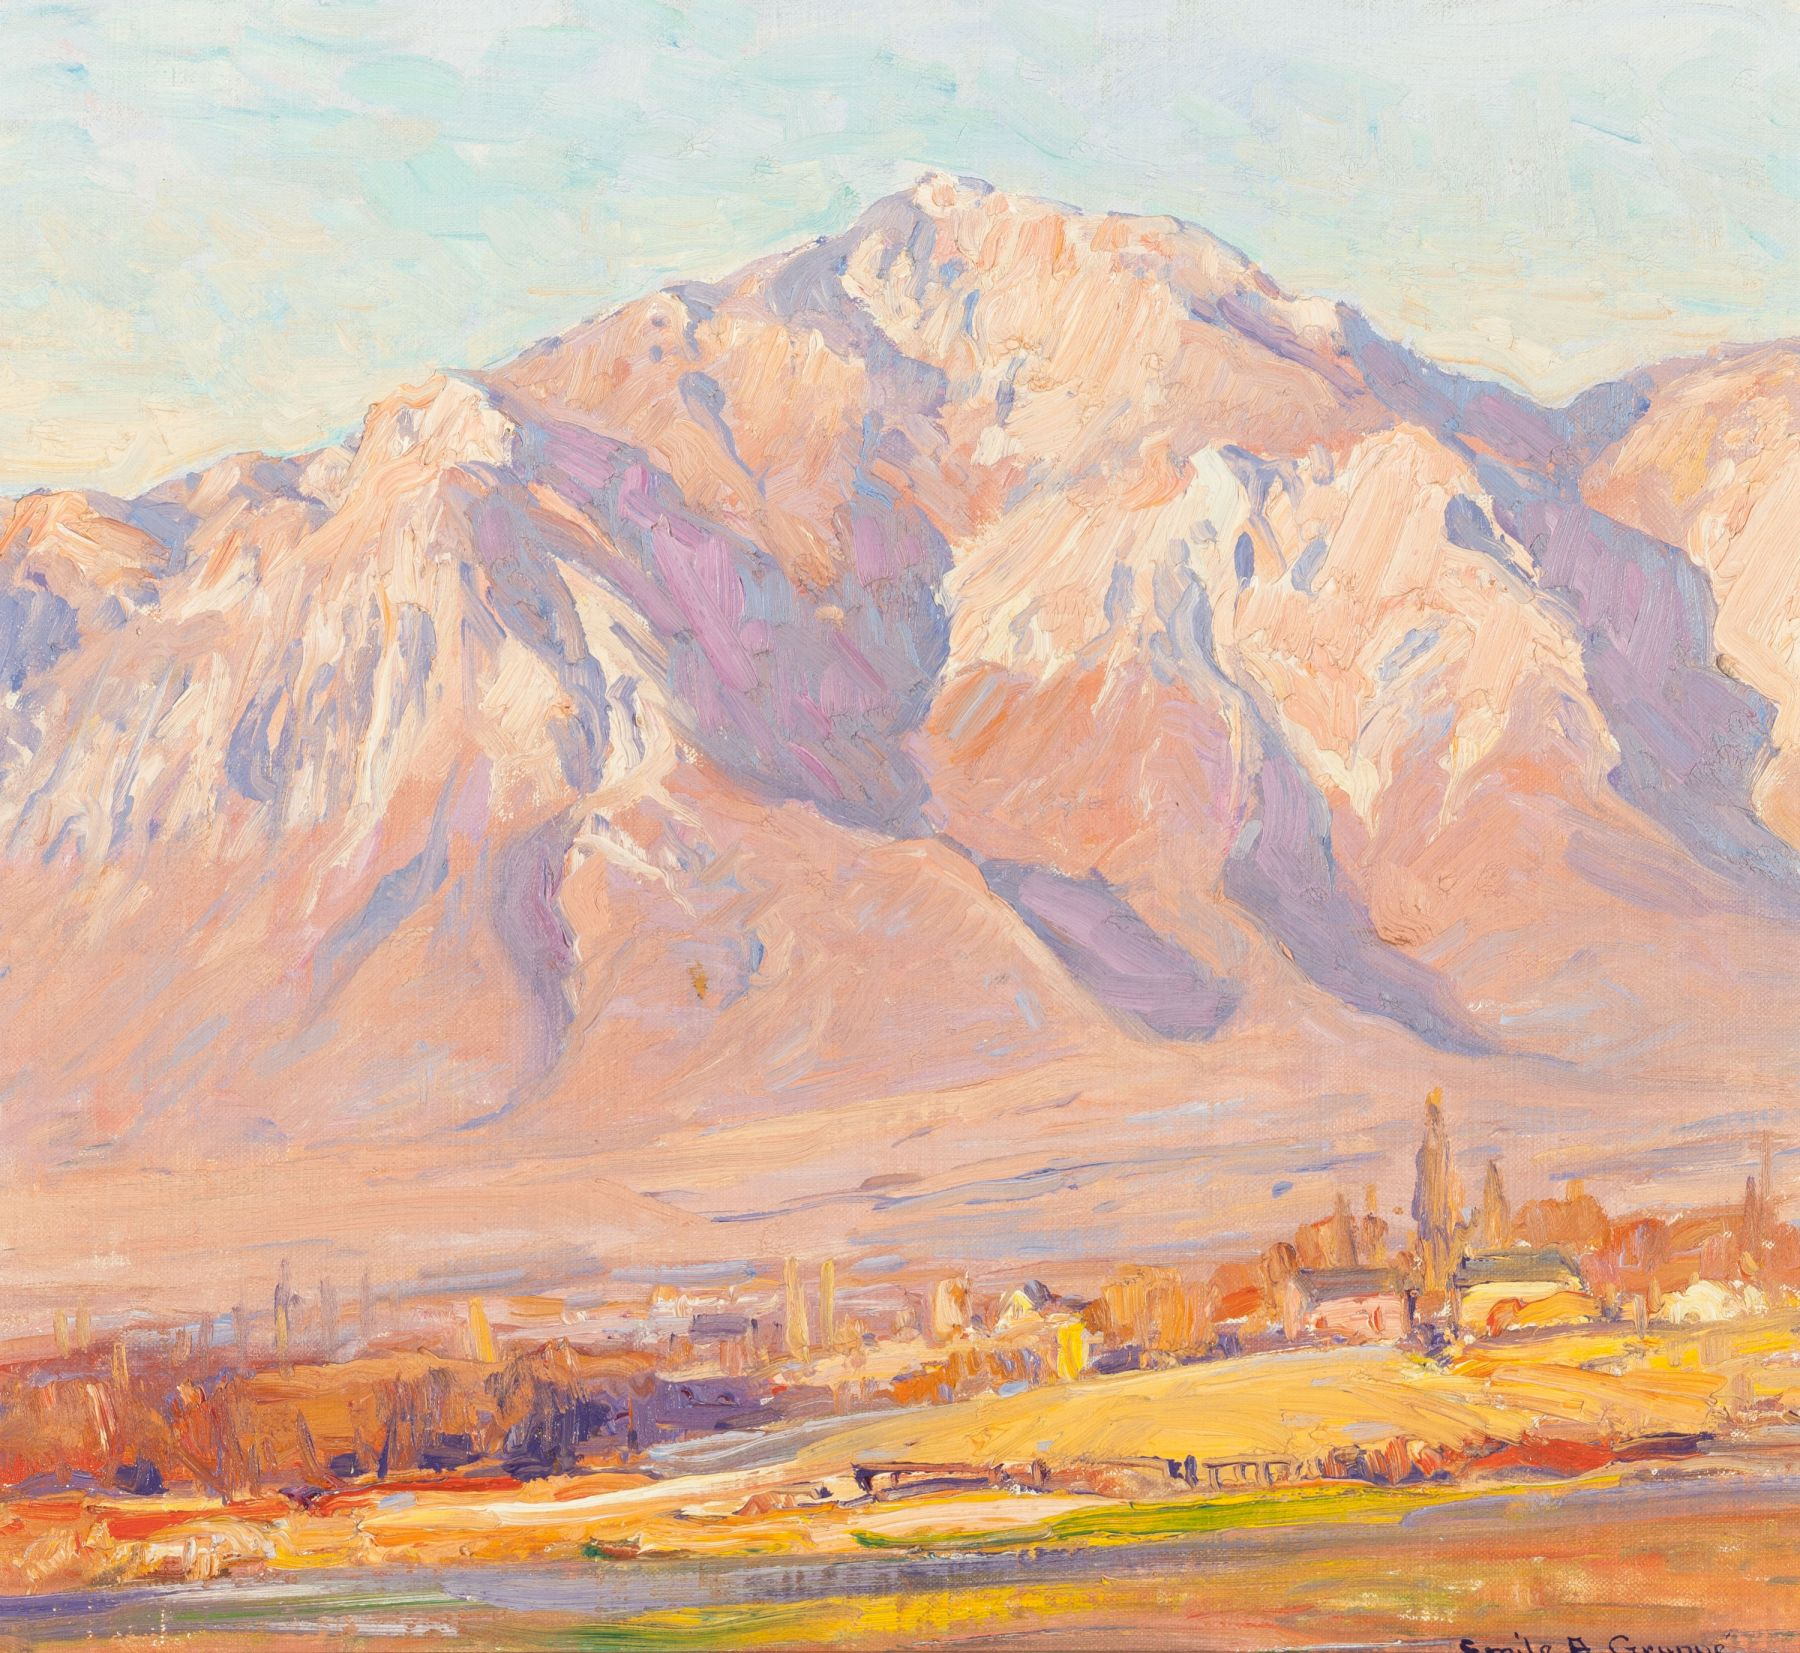 Emile A Gruppe, Ben Lomond, Utah, Utah landscape, utah art,